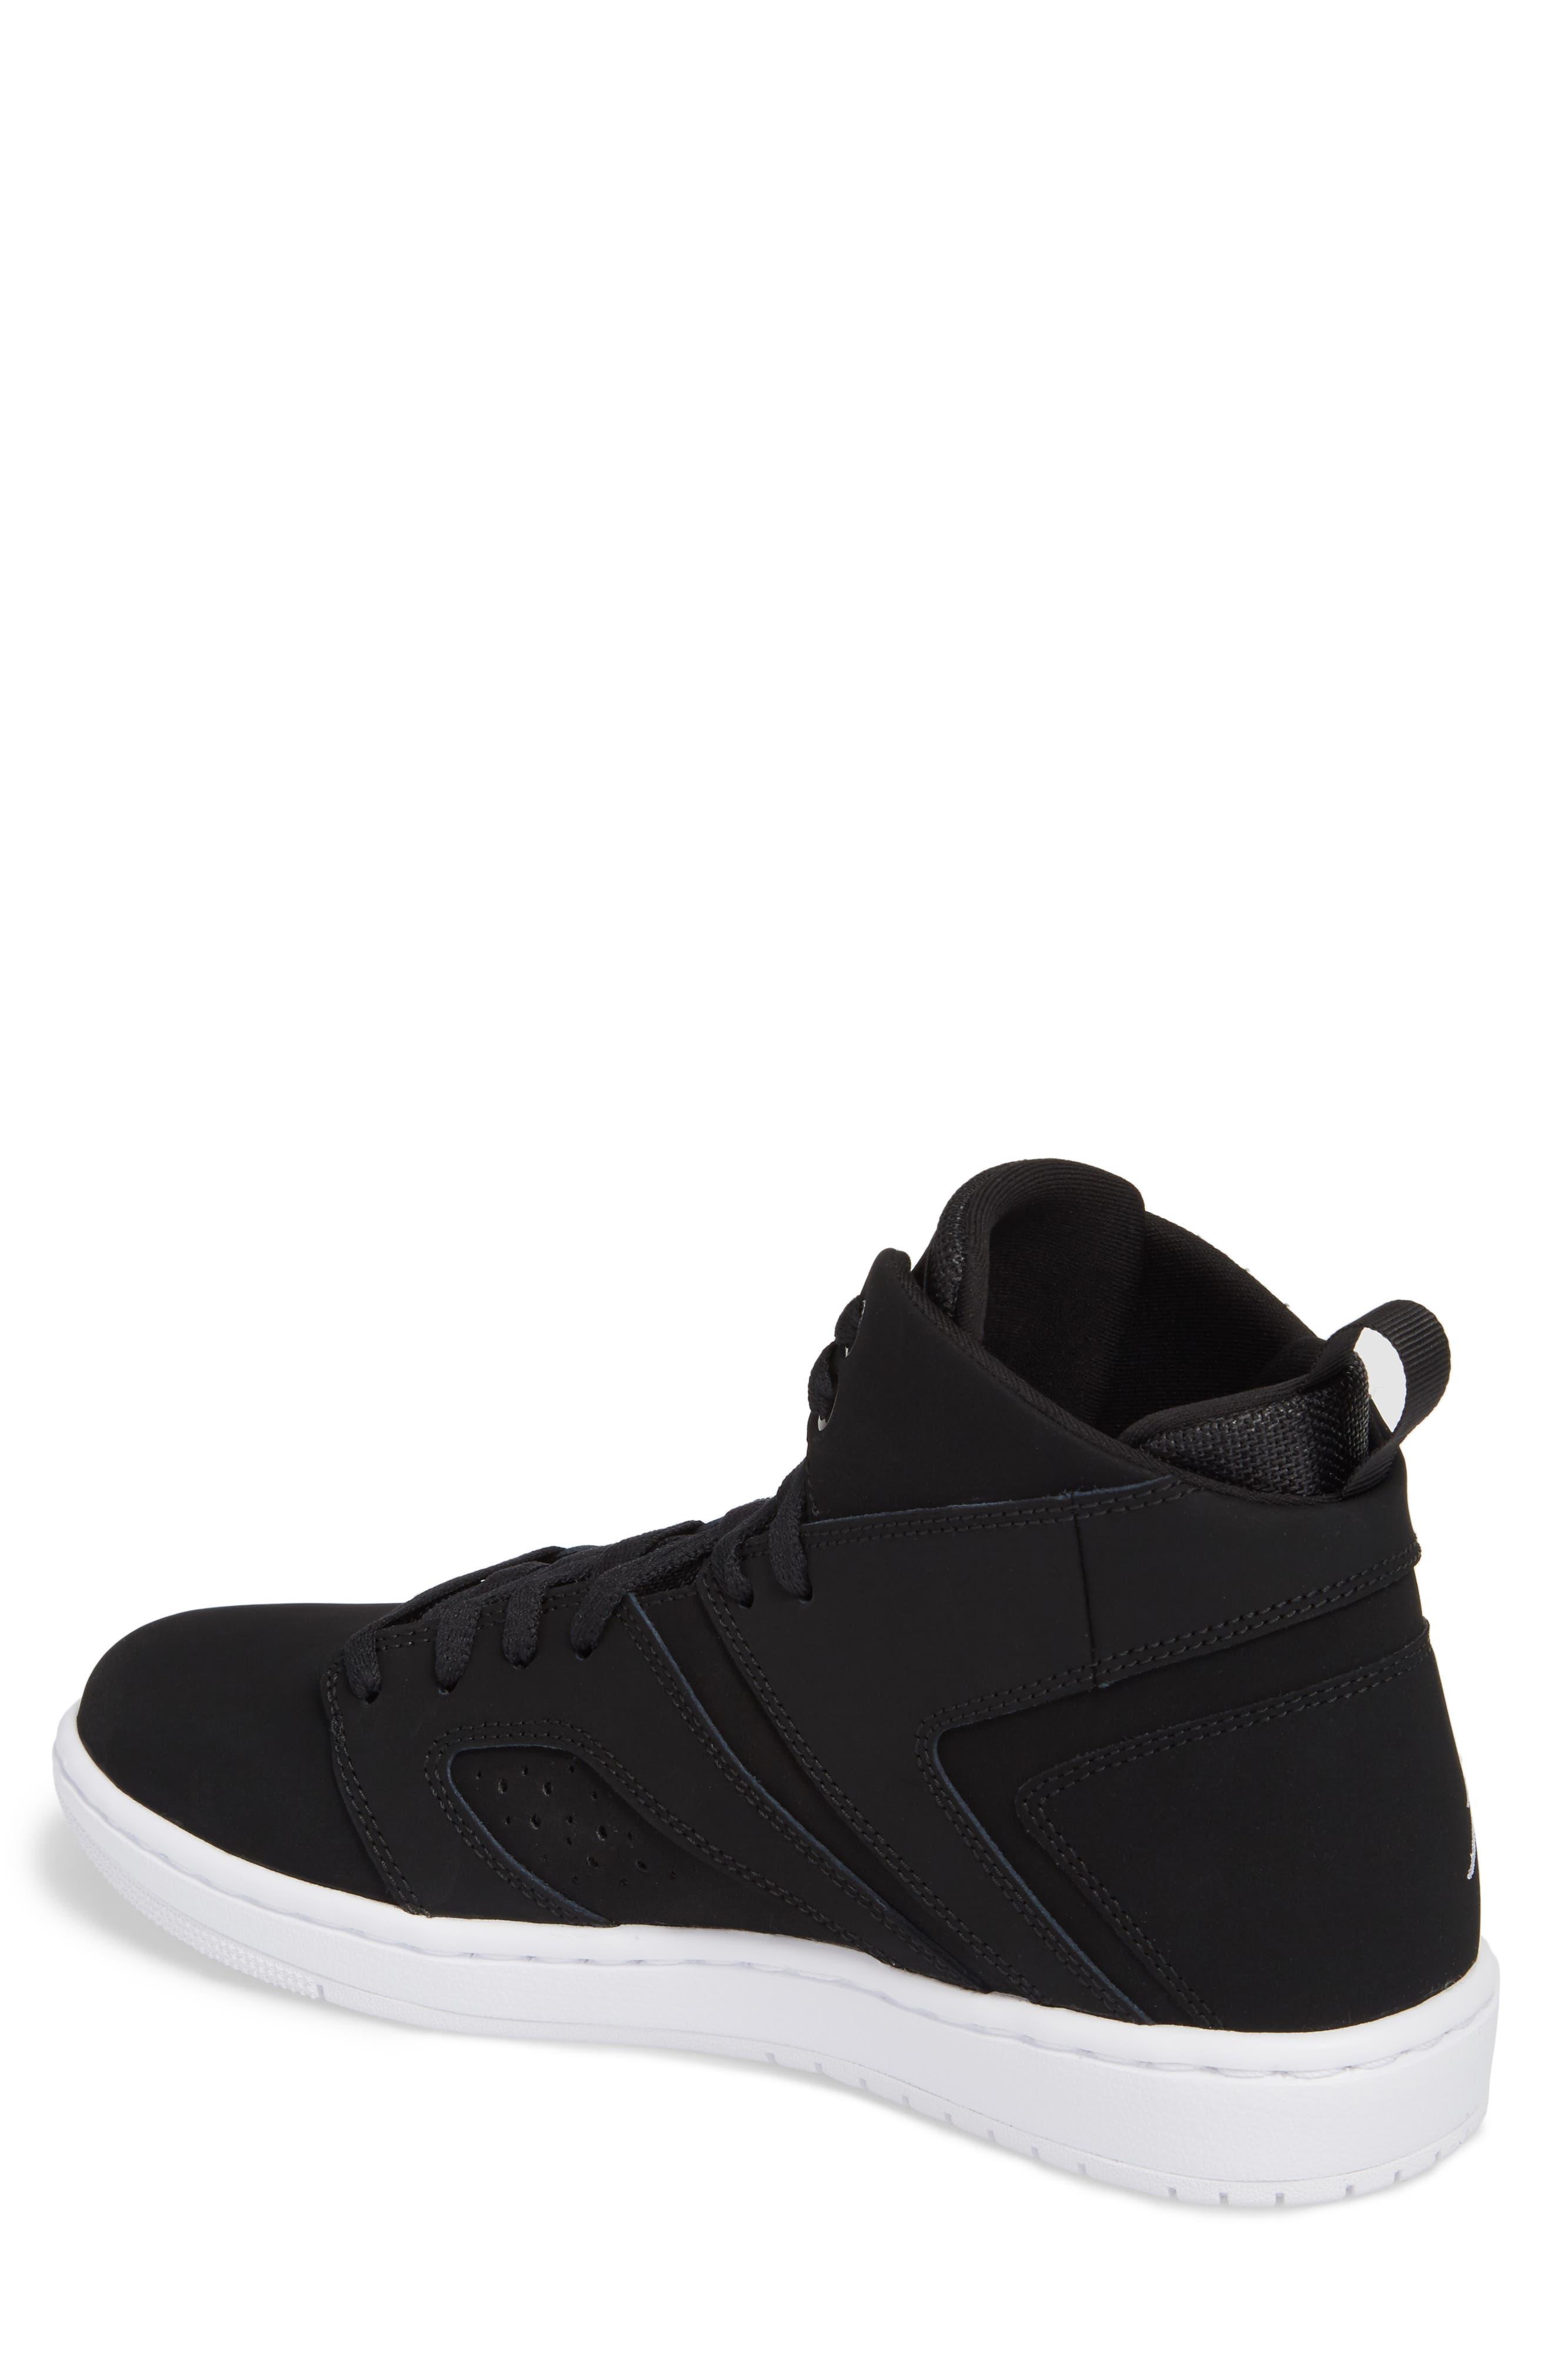 Air Jordan Flight Next Sneaker,                             Alternate thumbnail 2, color,                             010